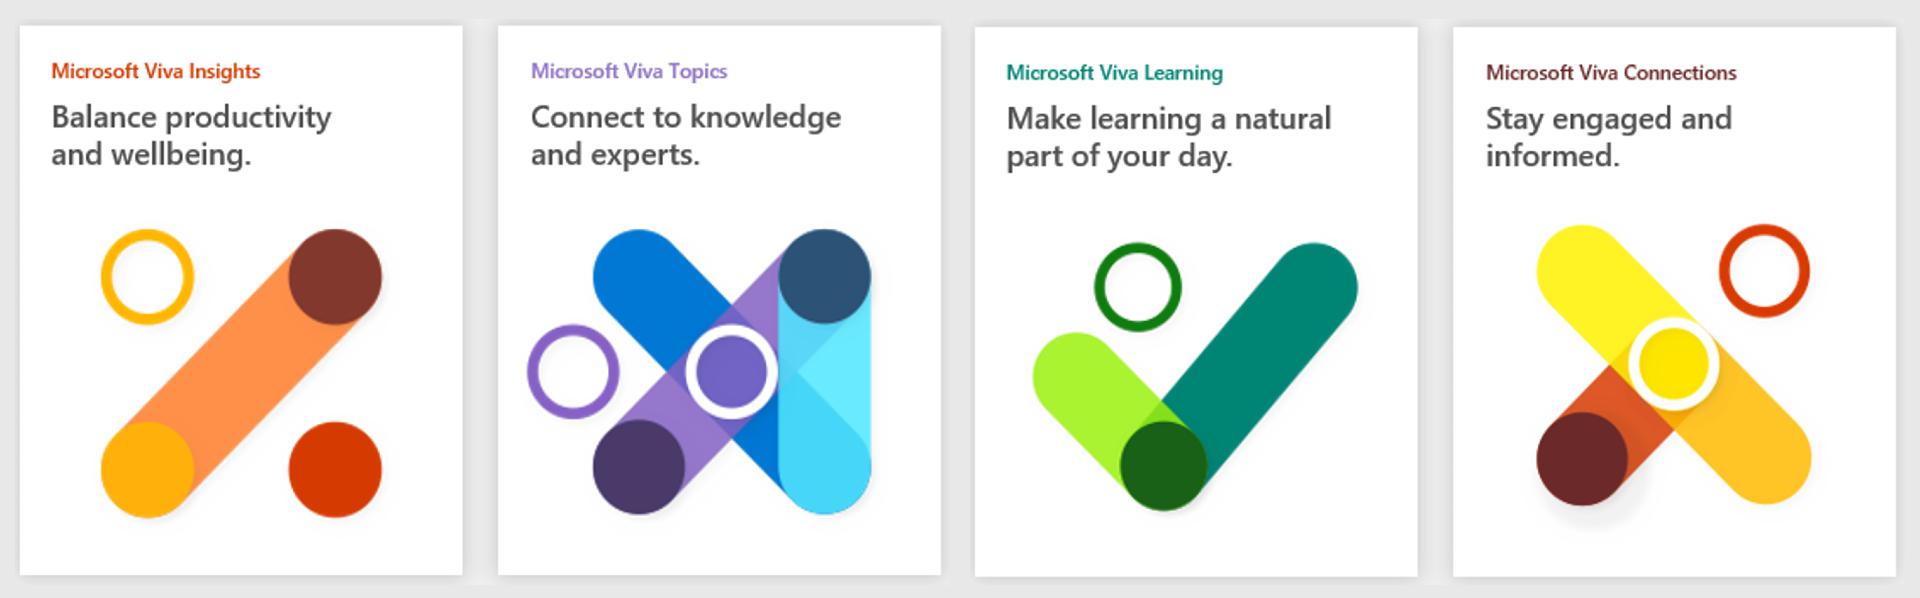 Microsoft Viva Icons